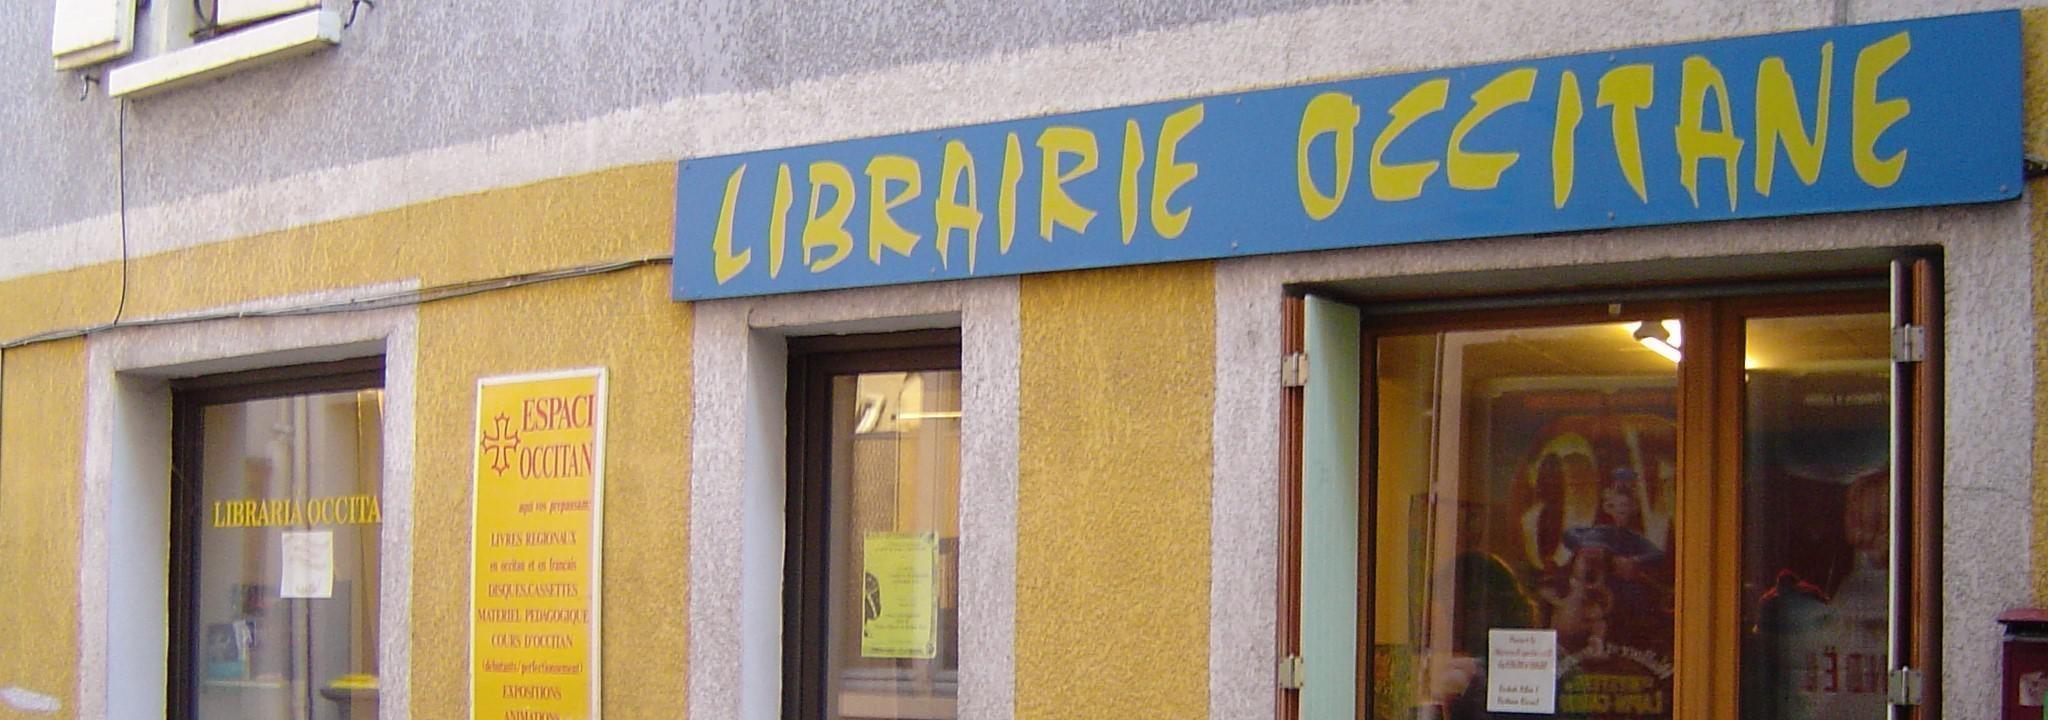 Librairie Occitane à Gap